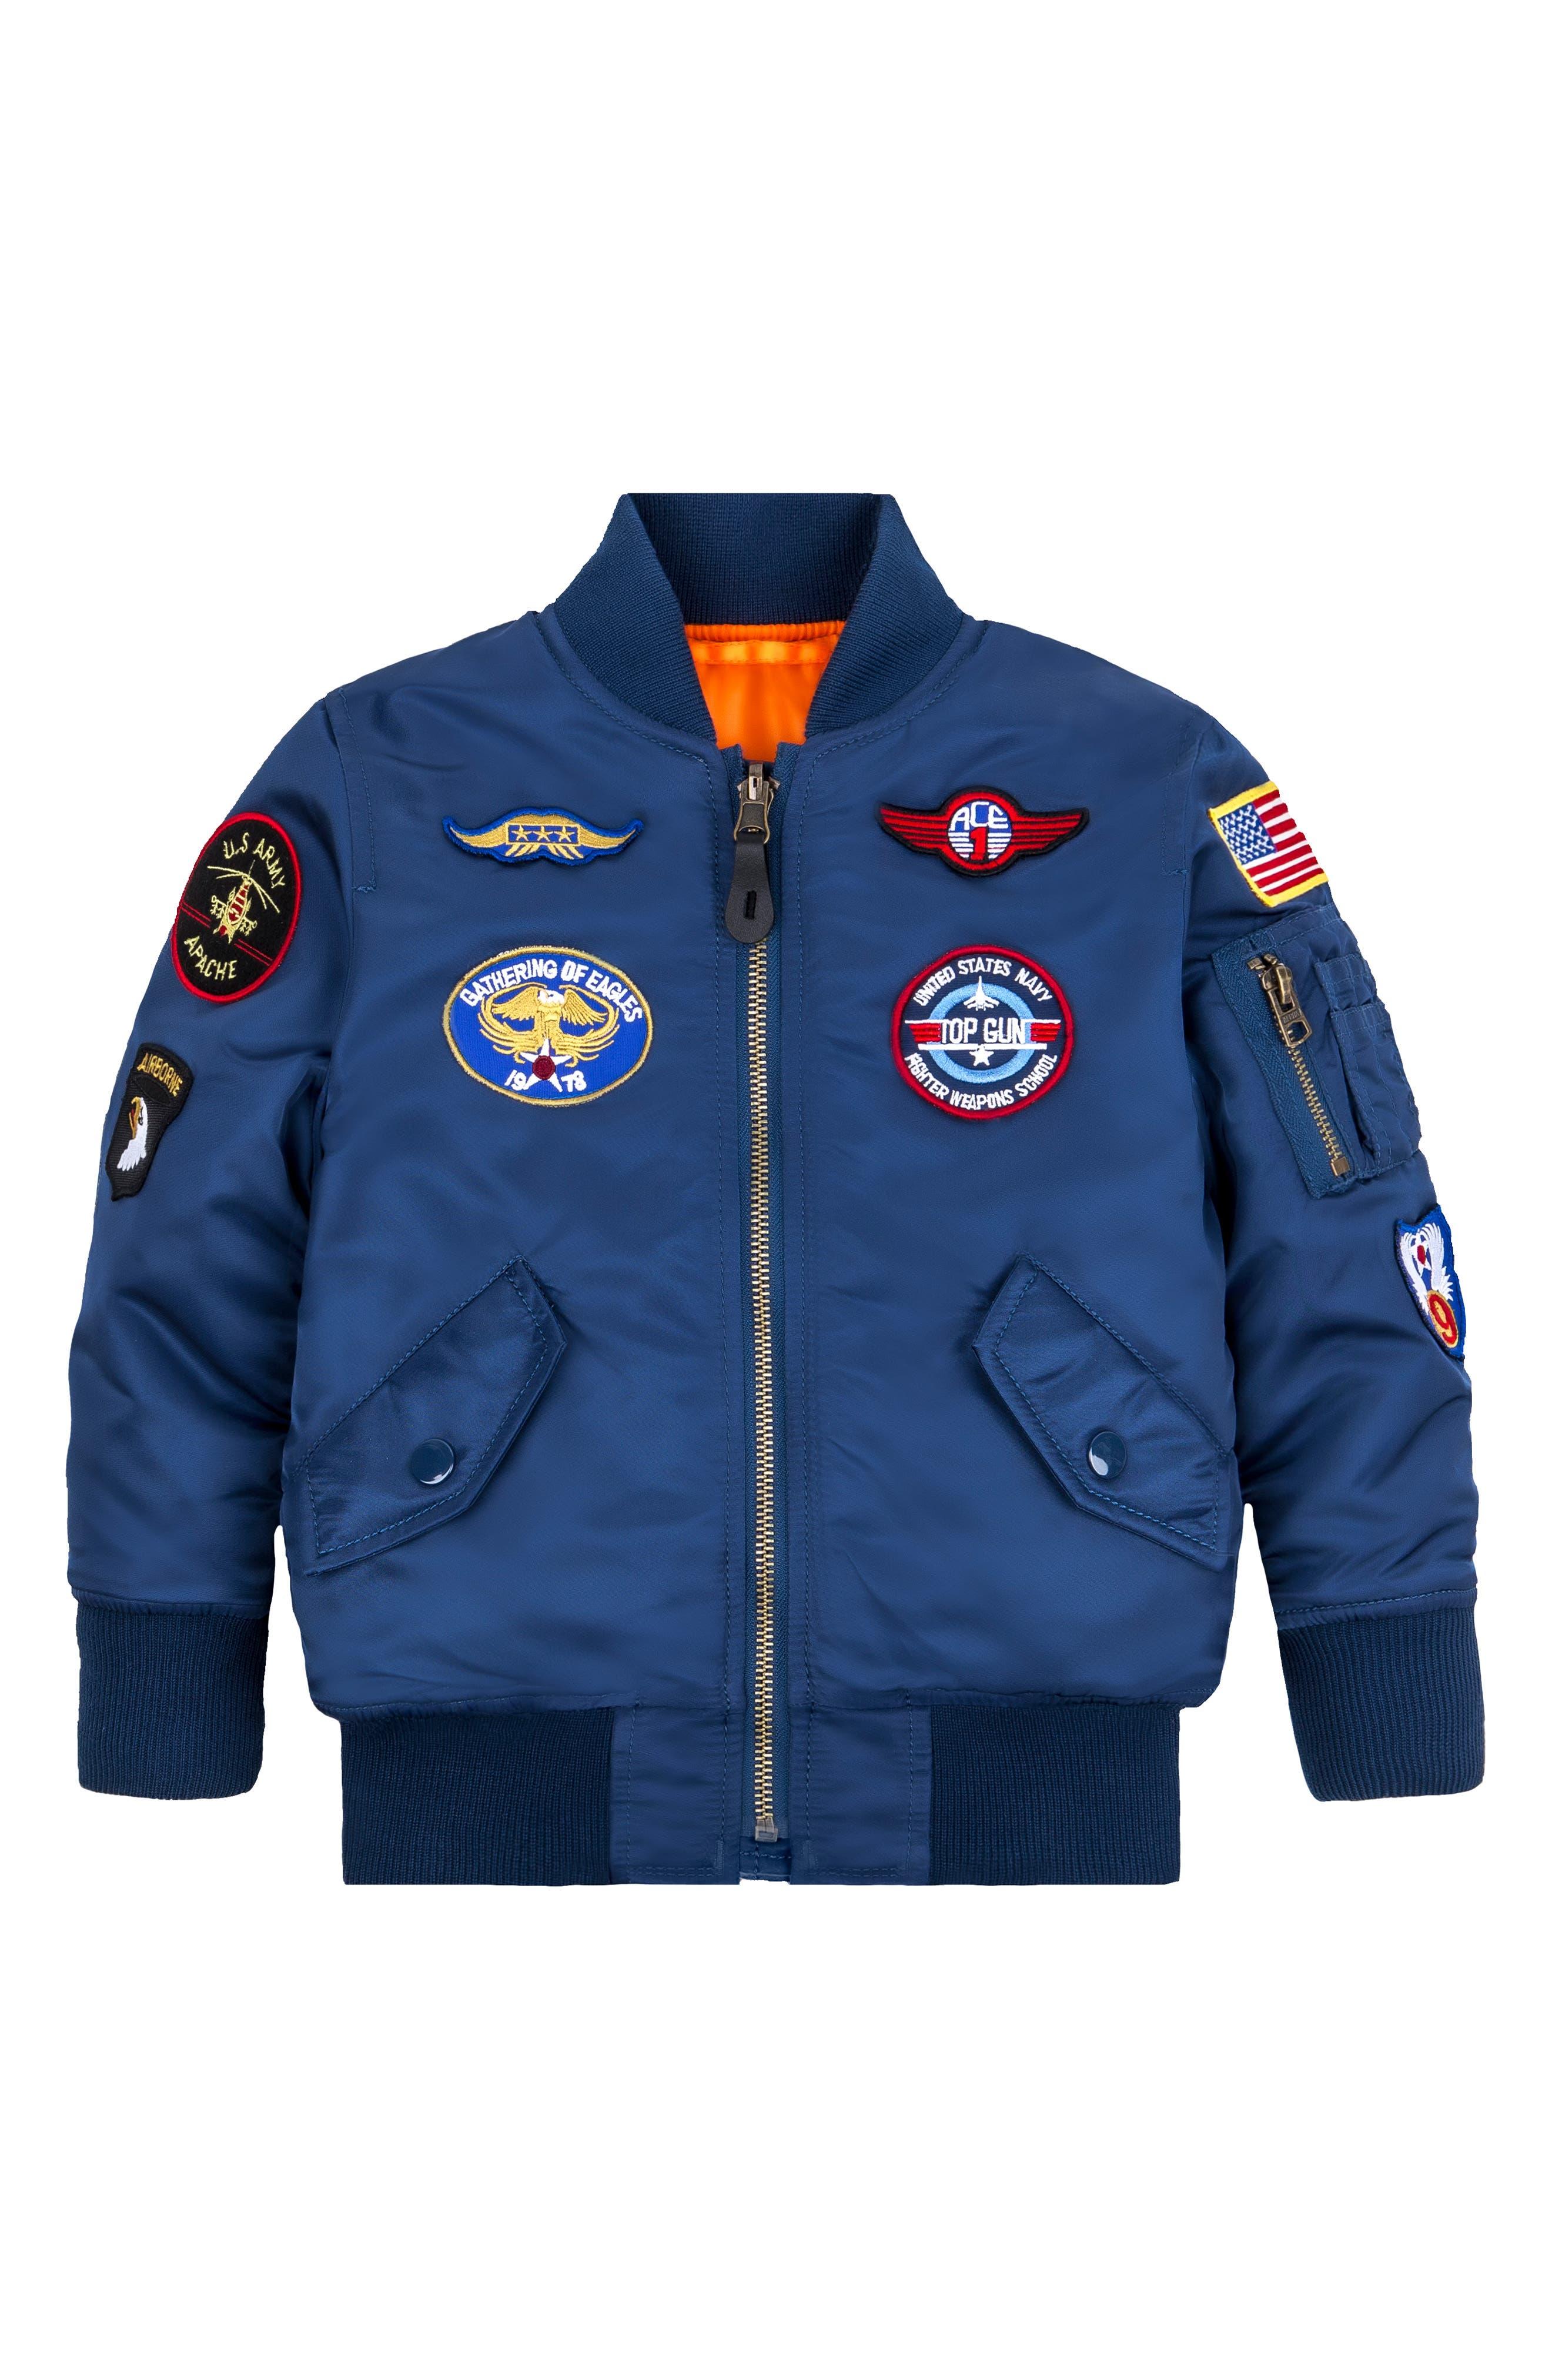 MA-1 Patch Flight Jacket,                             Main thumbnail 1, color,                             BLUE NO 9